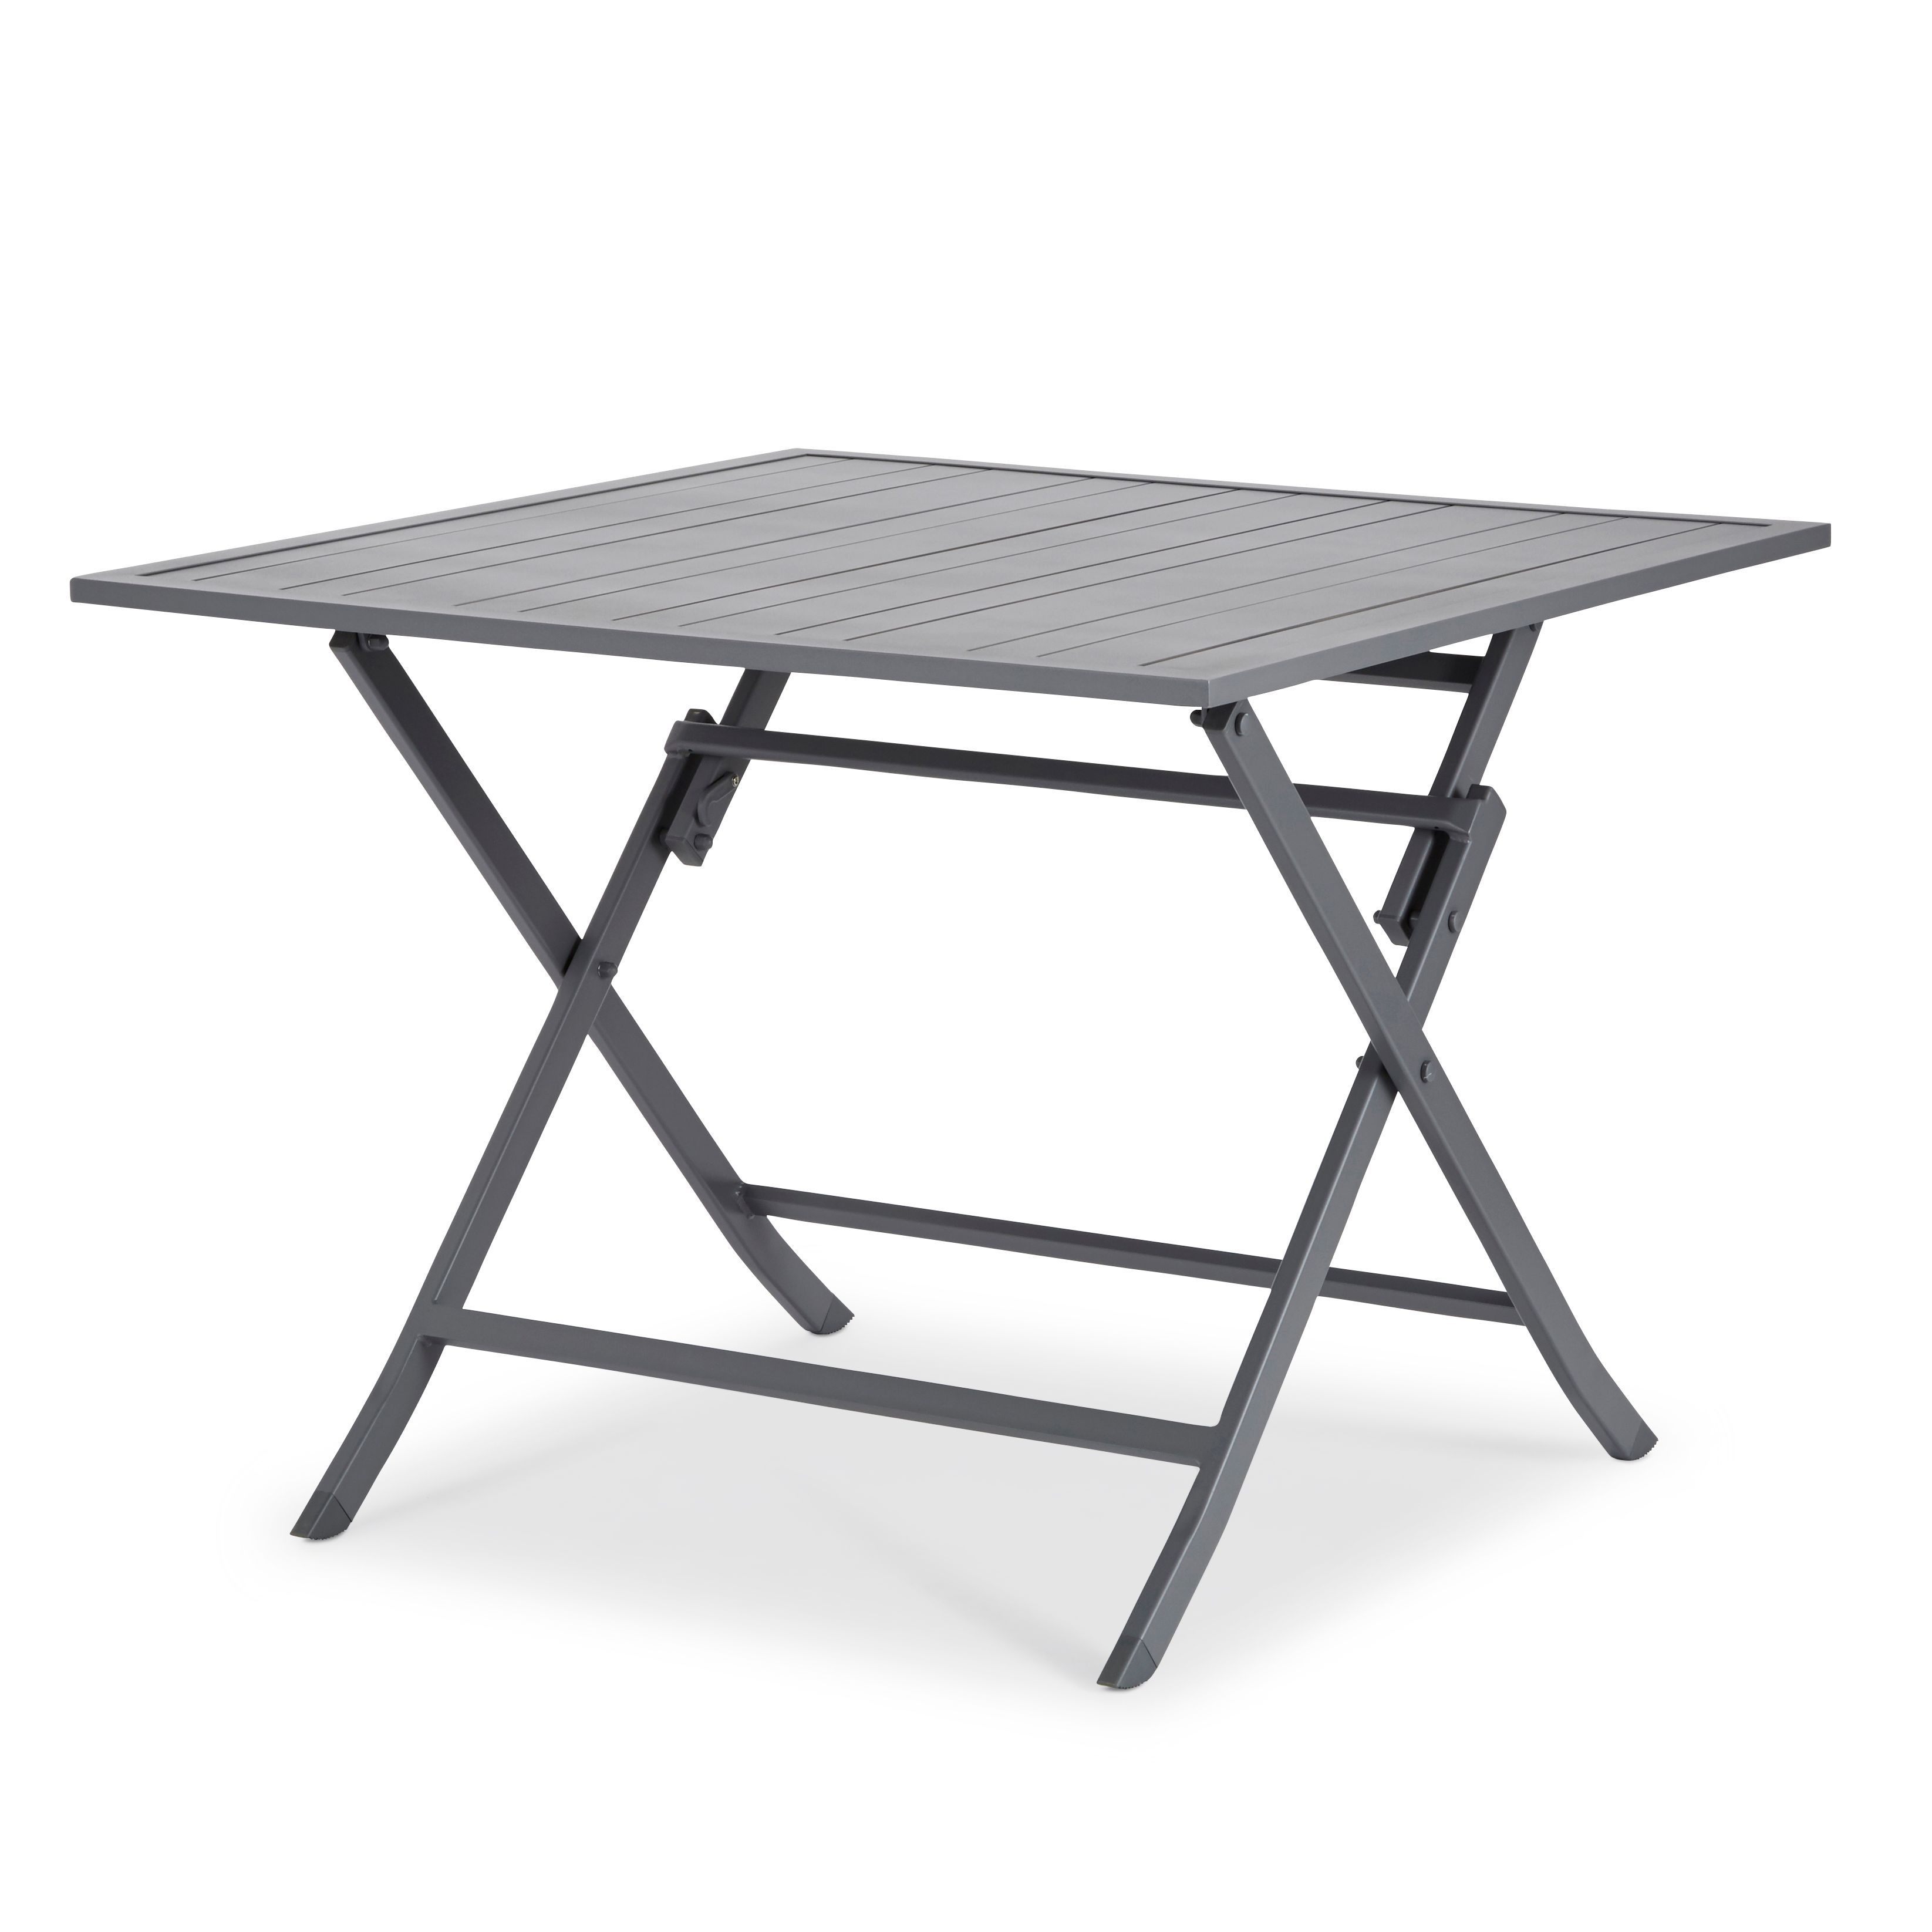 Batang Metal 4 Seater Dining Table